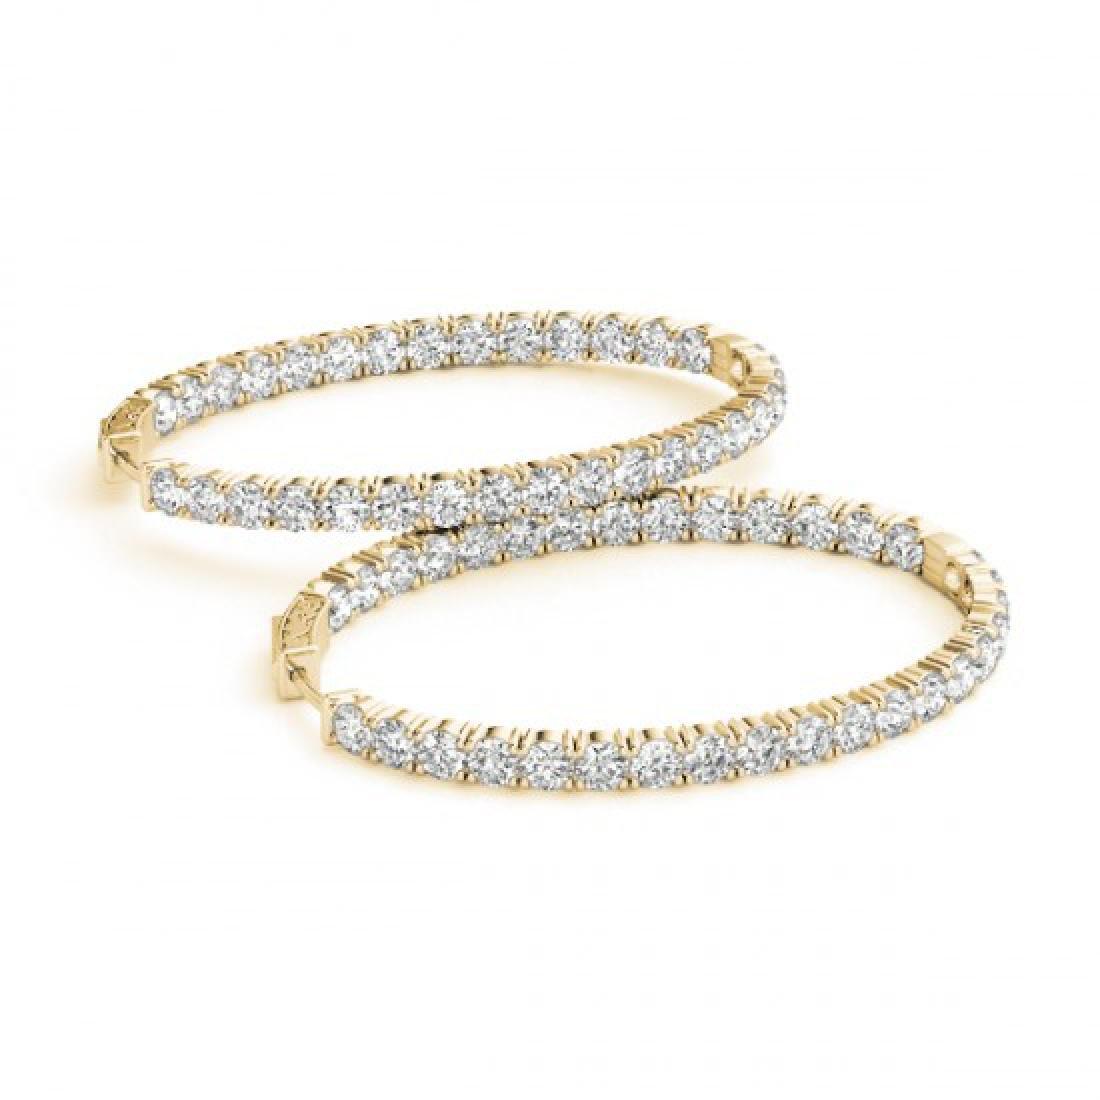 6 CTW Diamond VS/SI Certified 46 Mm Hoop Earrings 14K